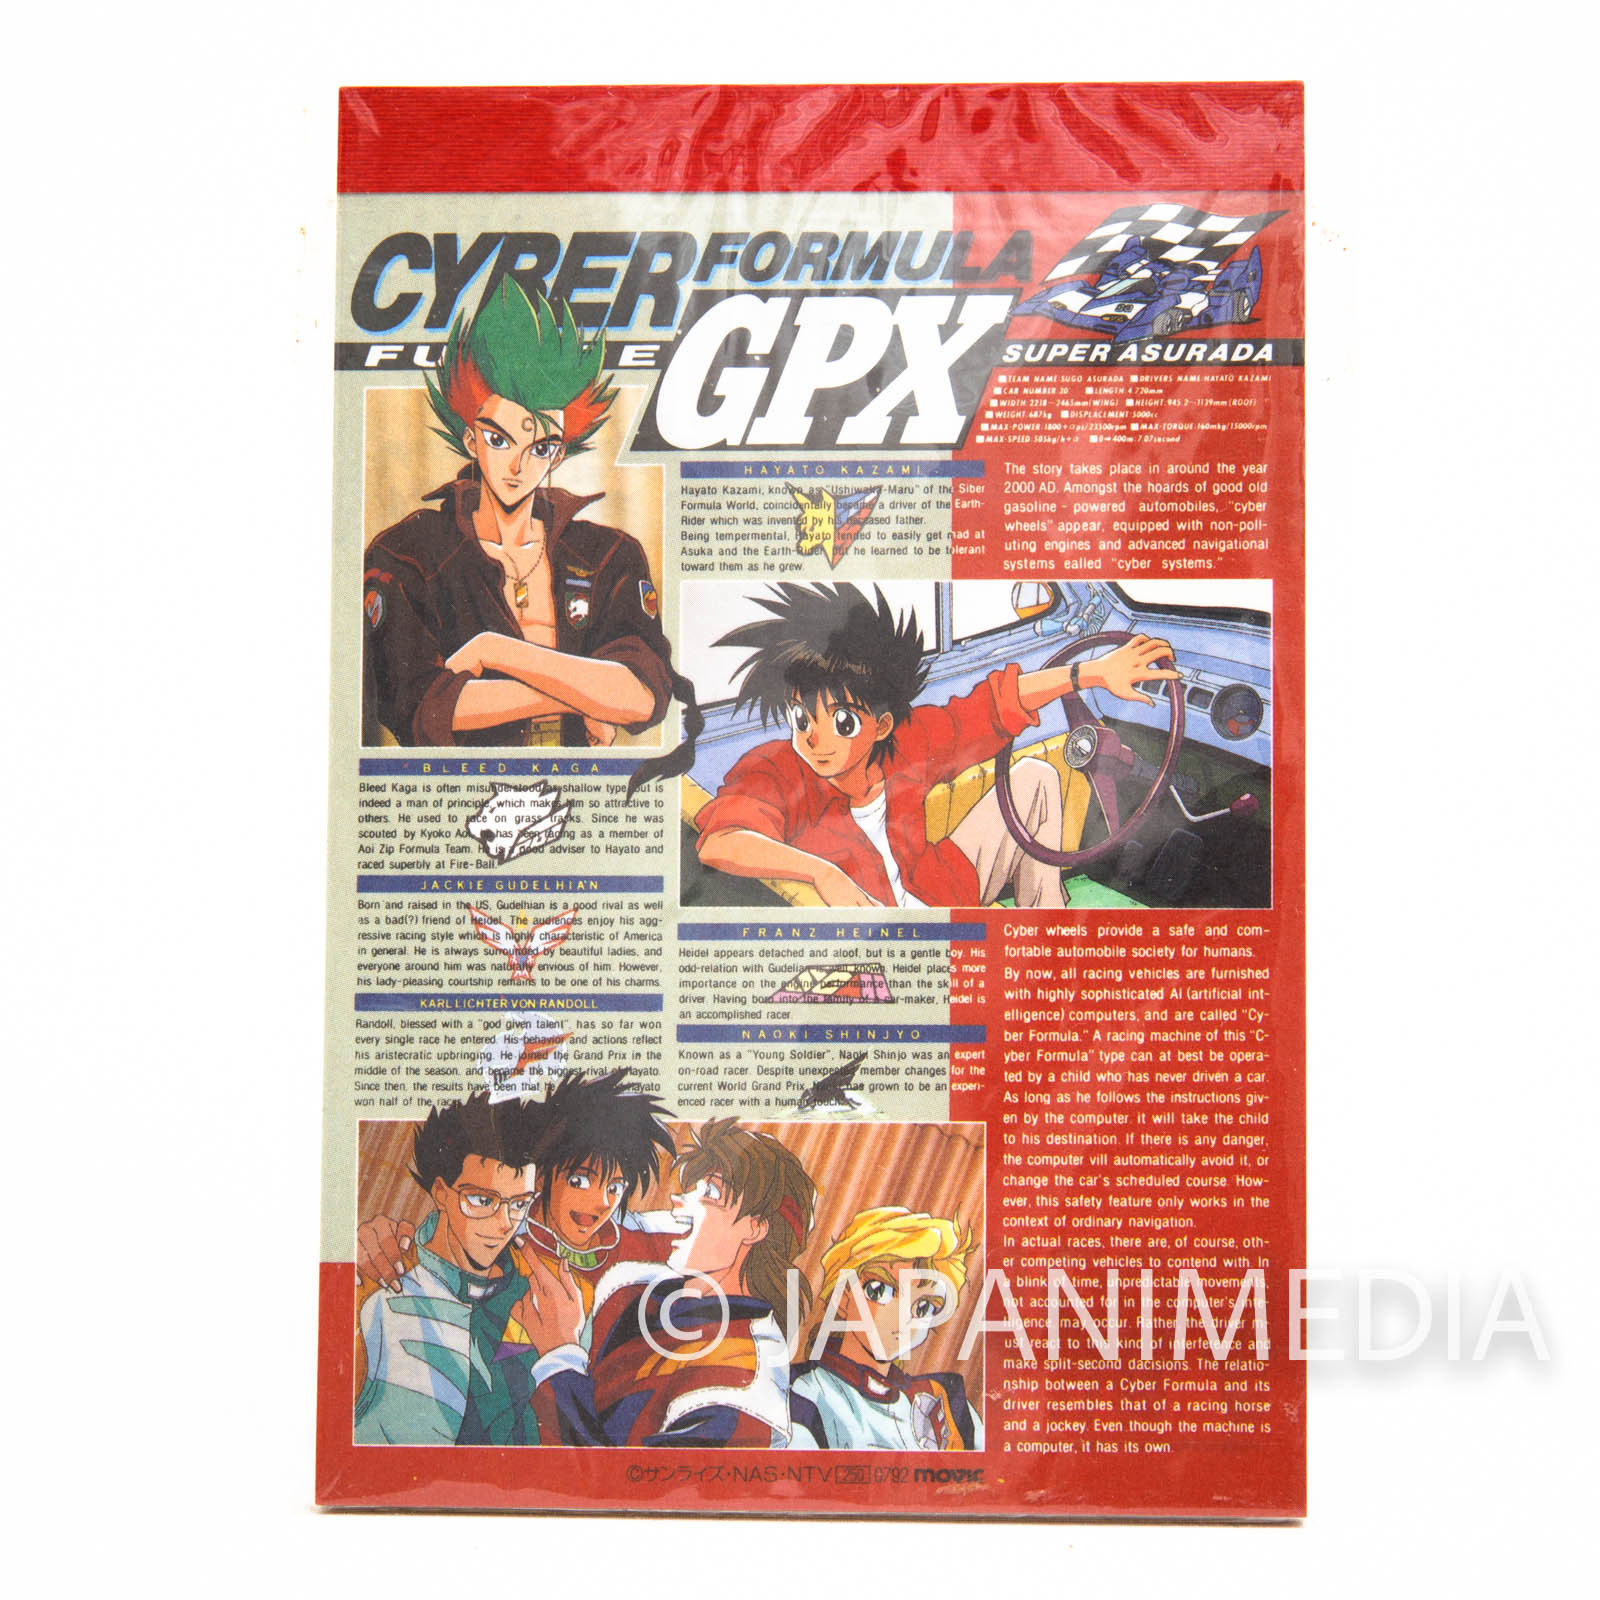 Future GPX Cyber Formula Memo pad JAPAN ANIME